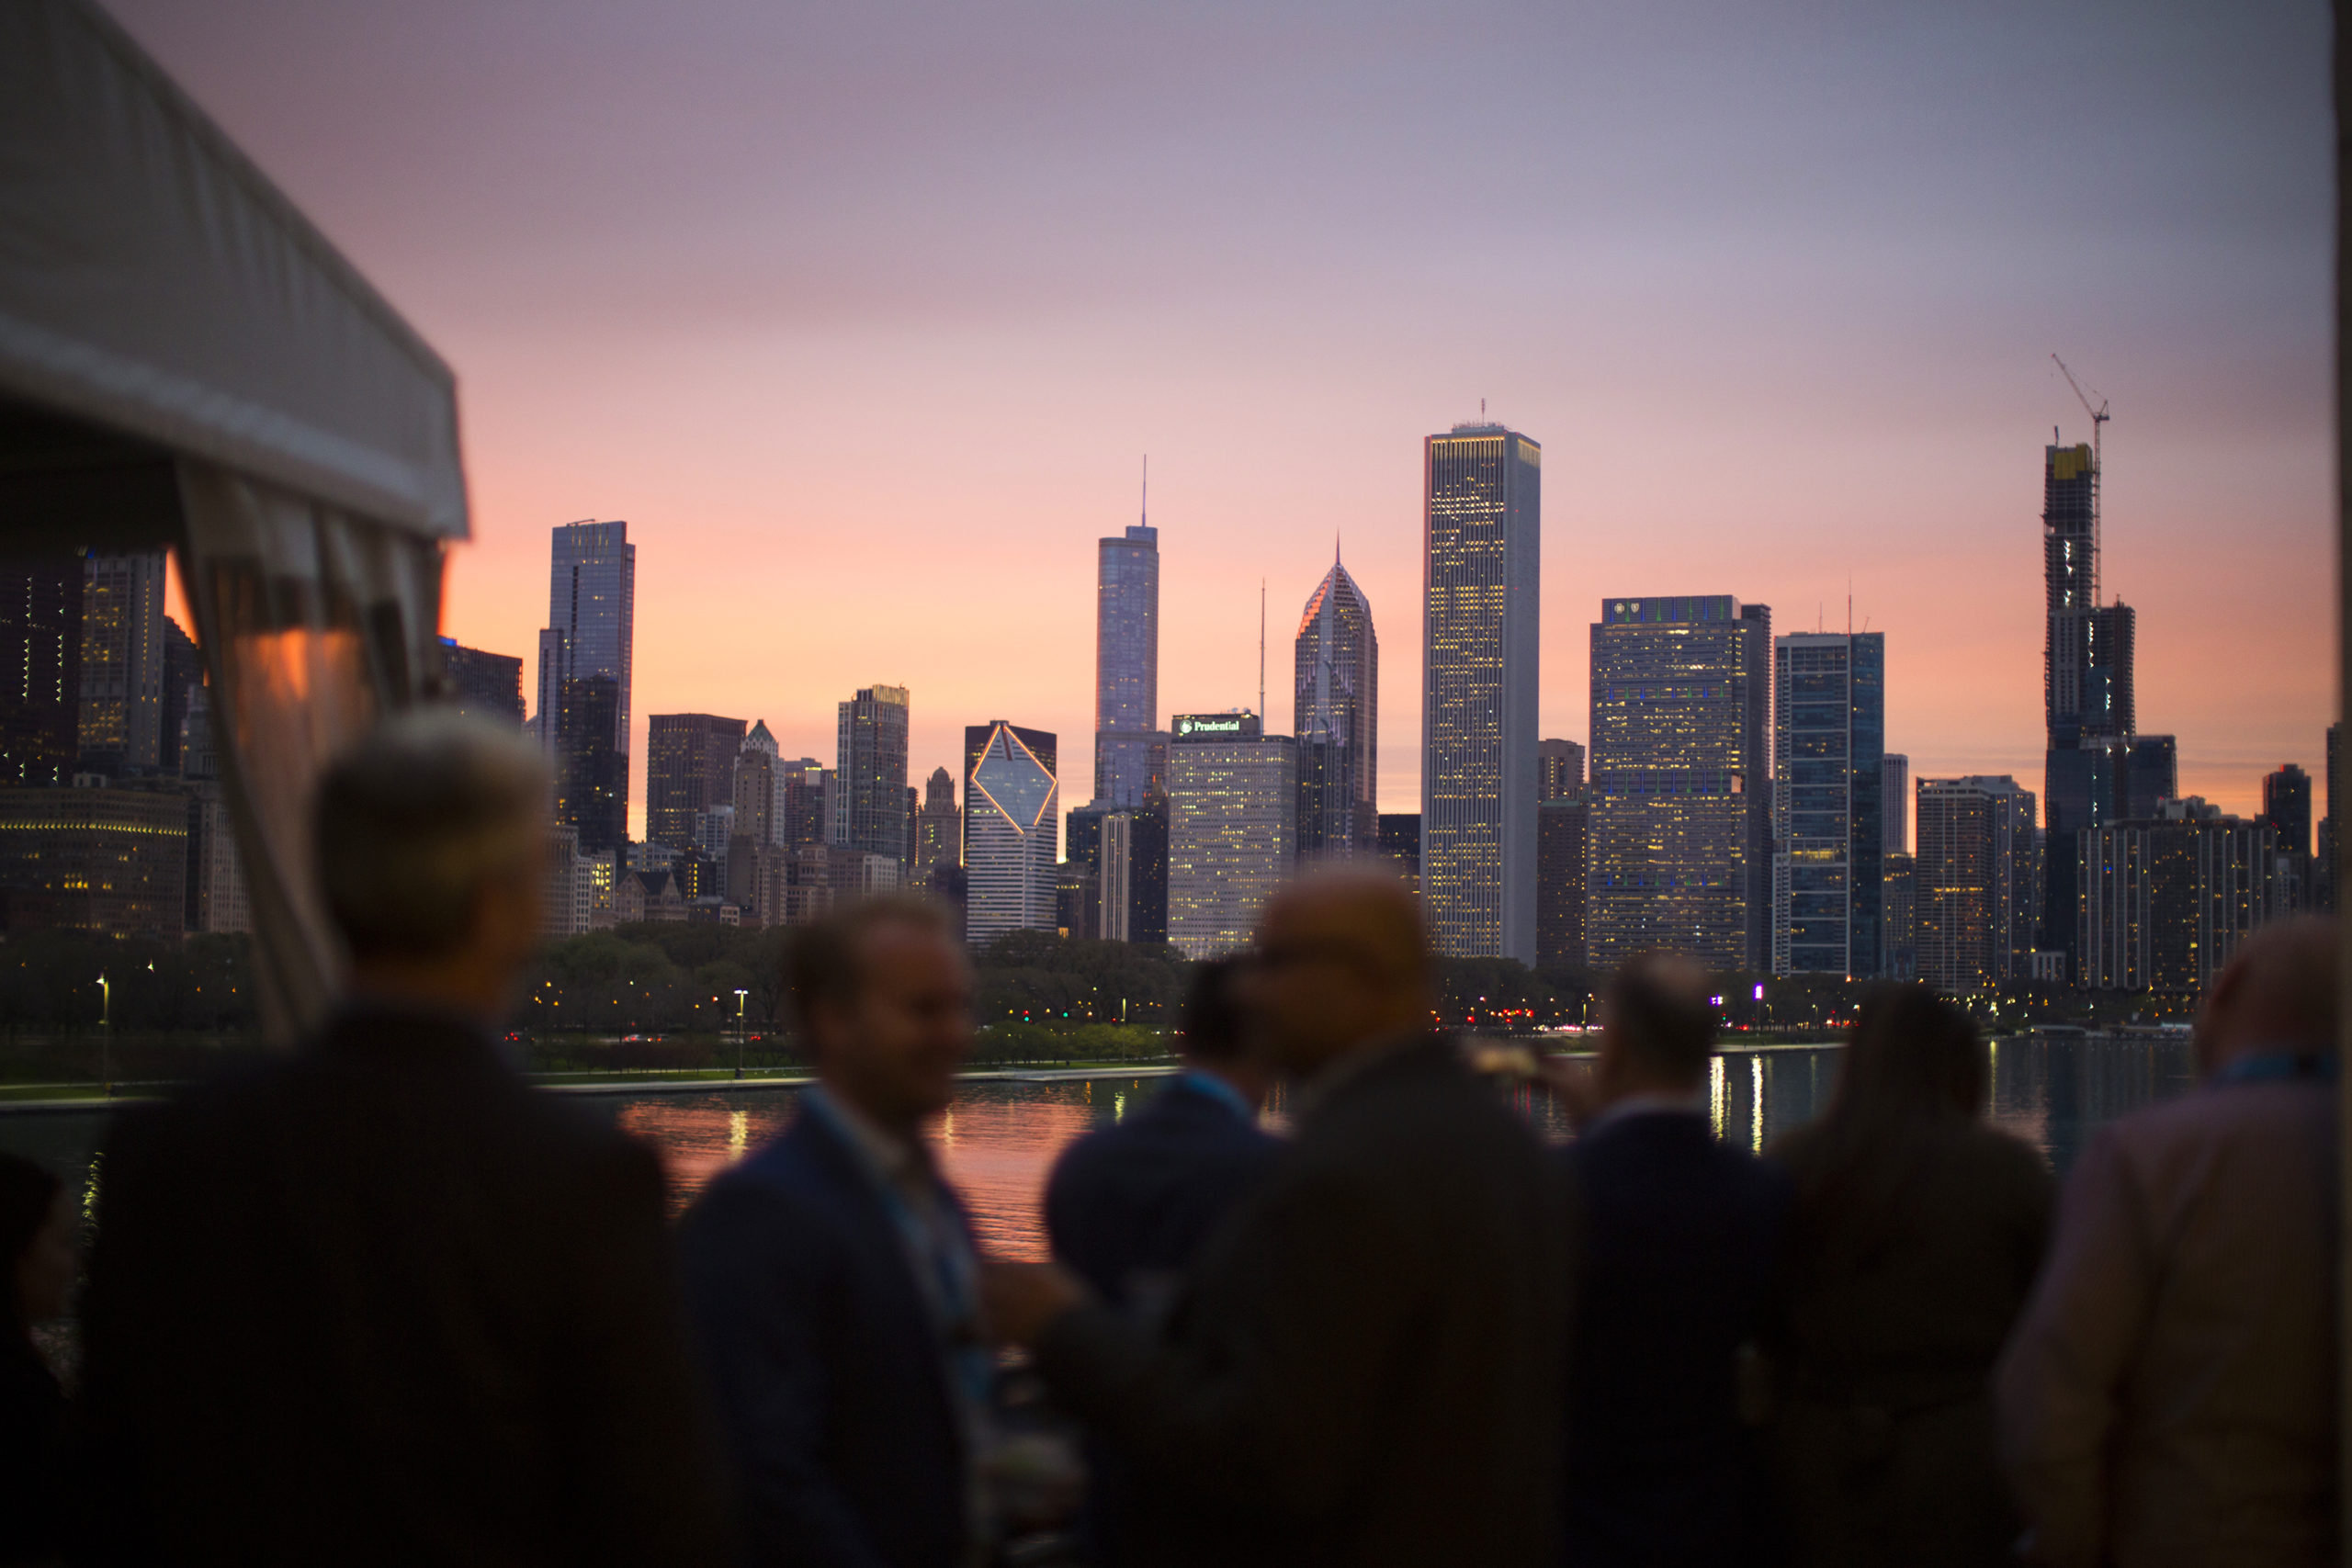 Overlooking Chicago skyline